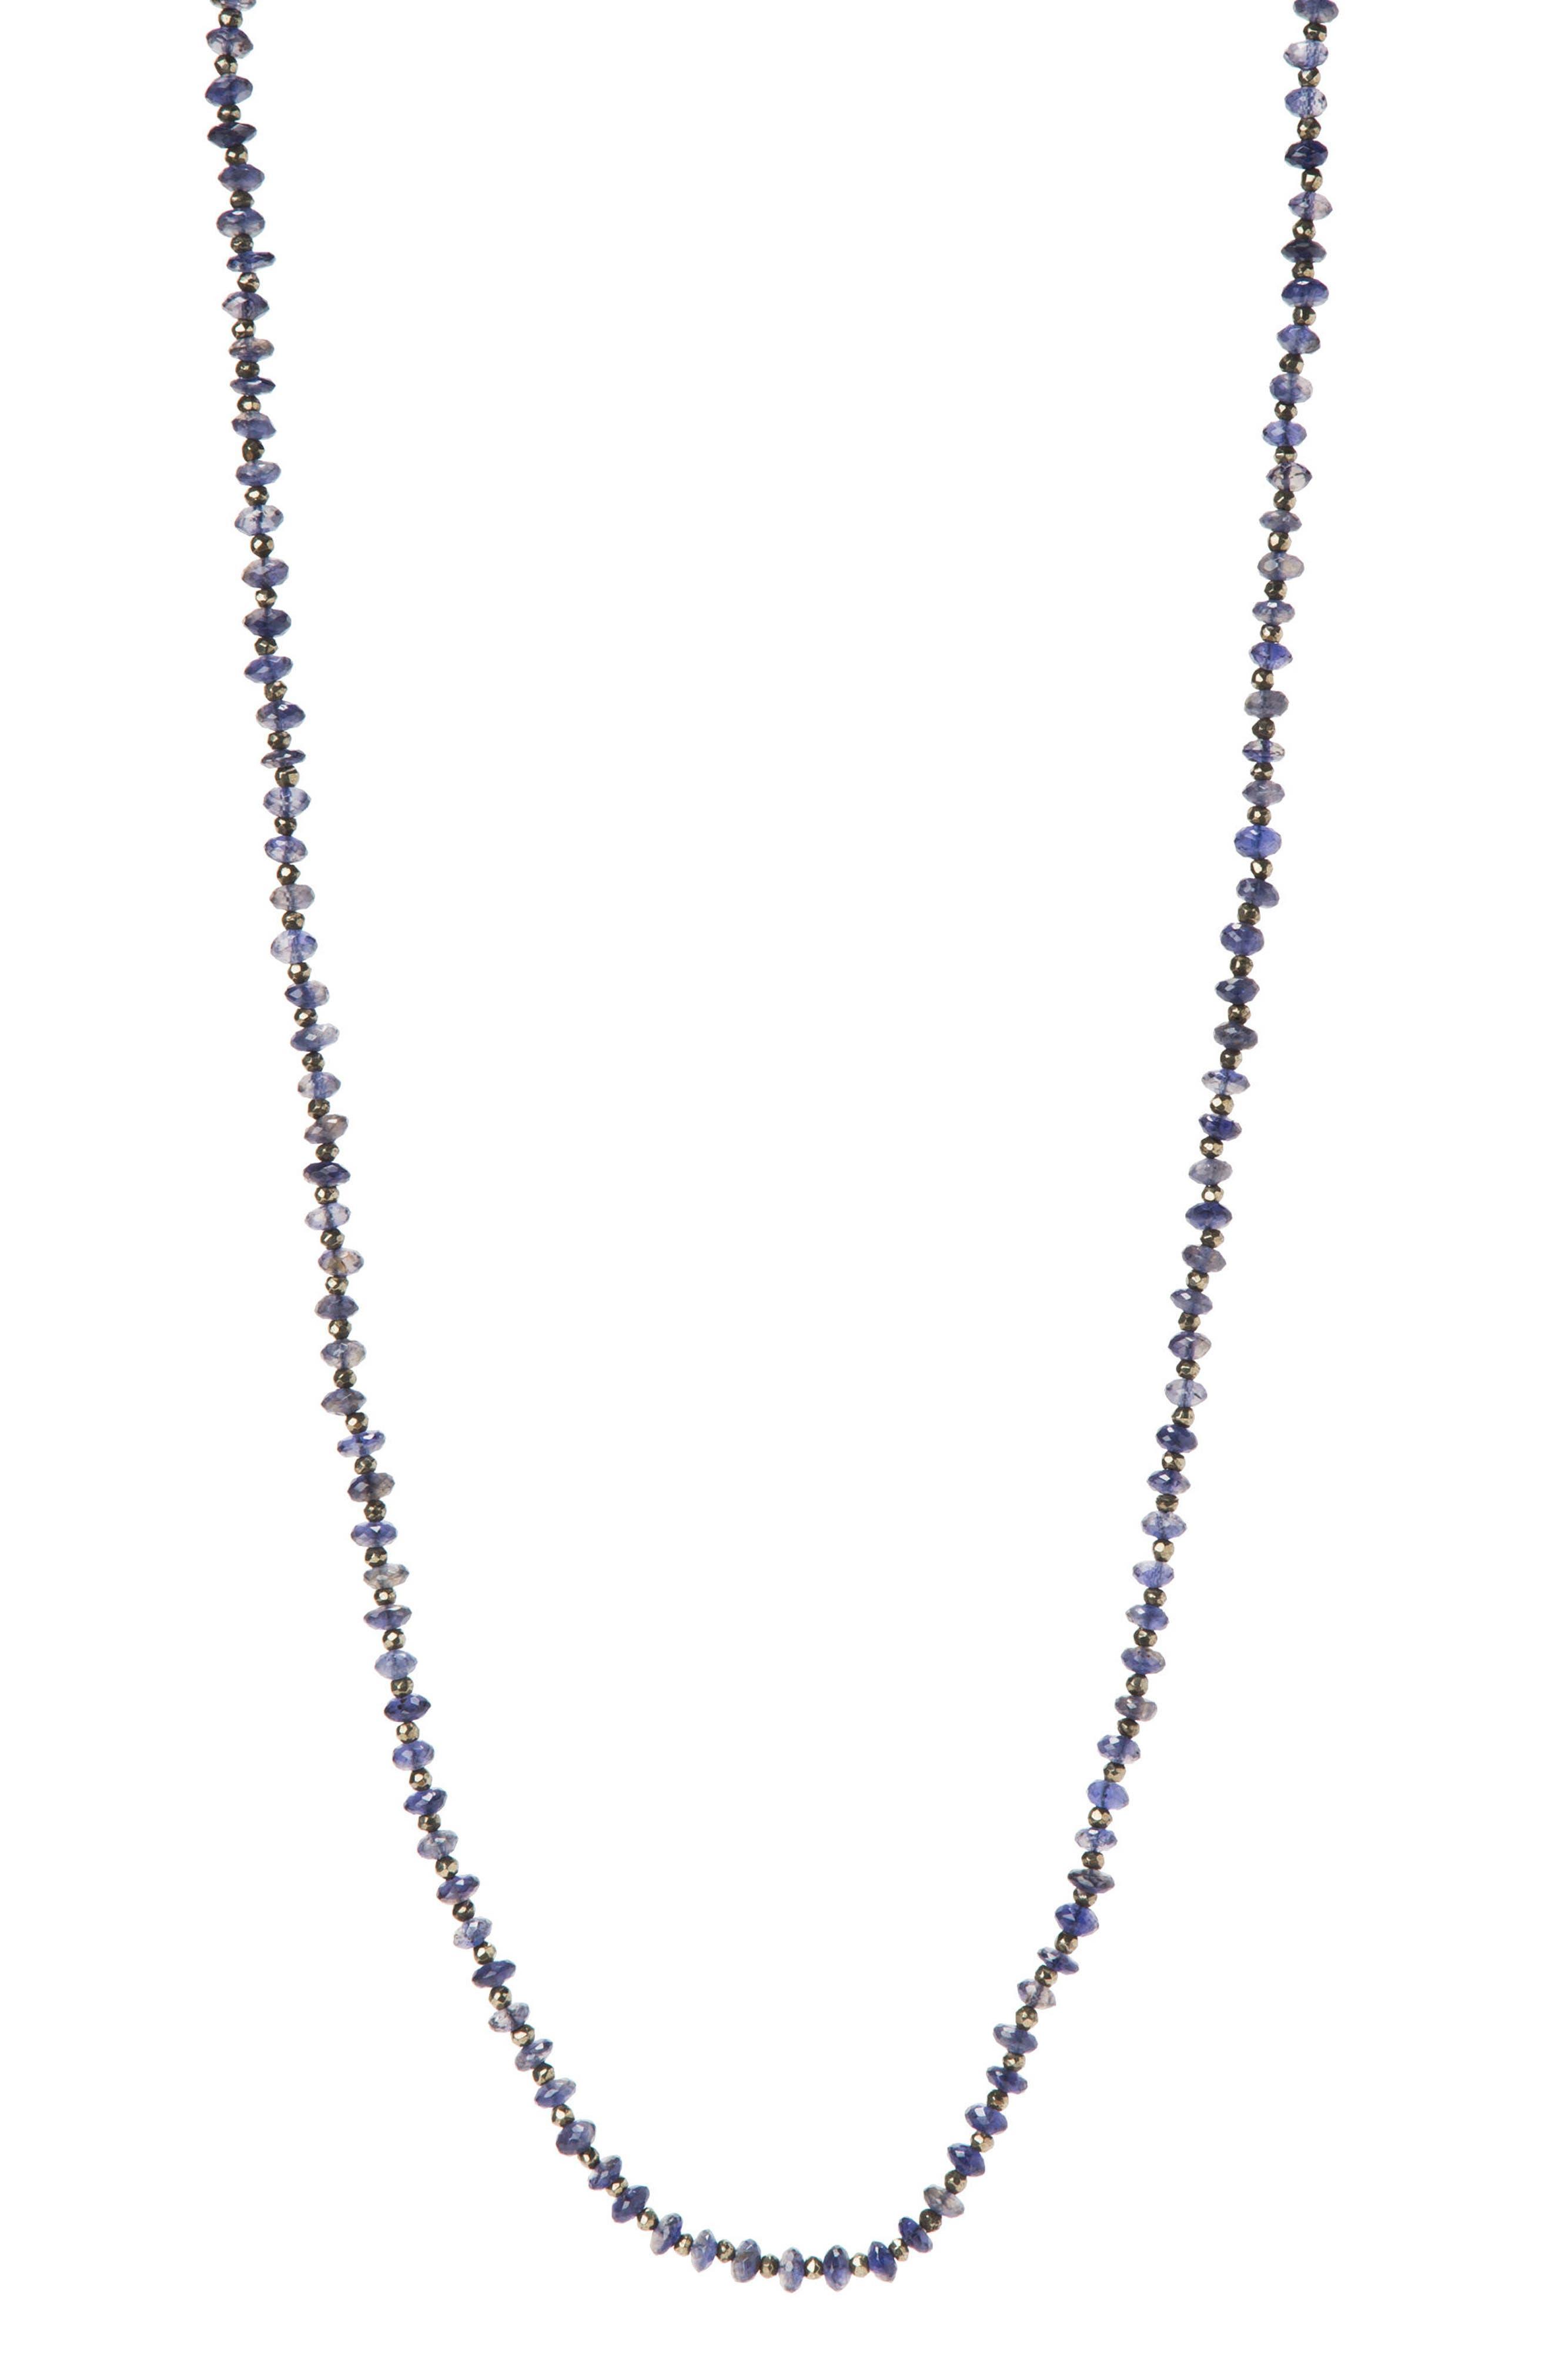 Alternate Image 1 Selected - Jemma Sands Solana Semiprecious Stone Necklace